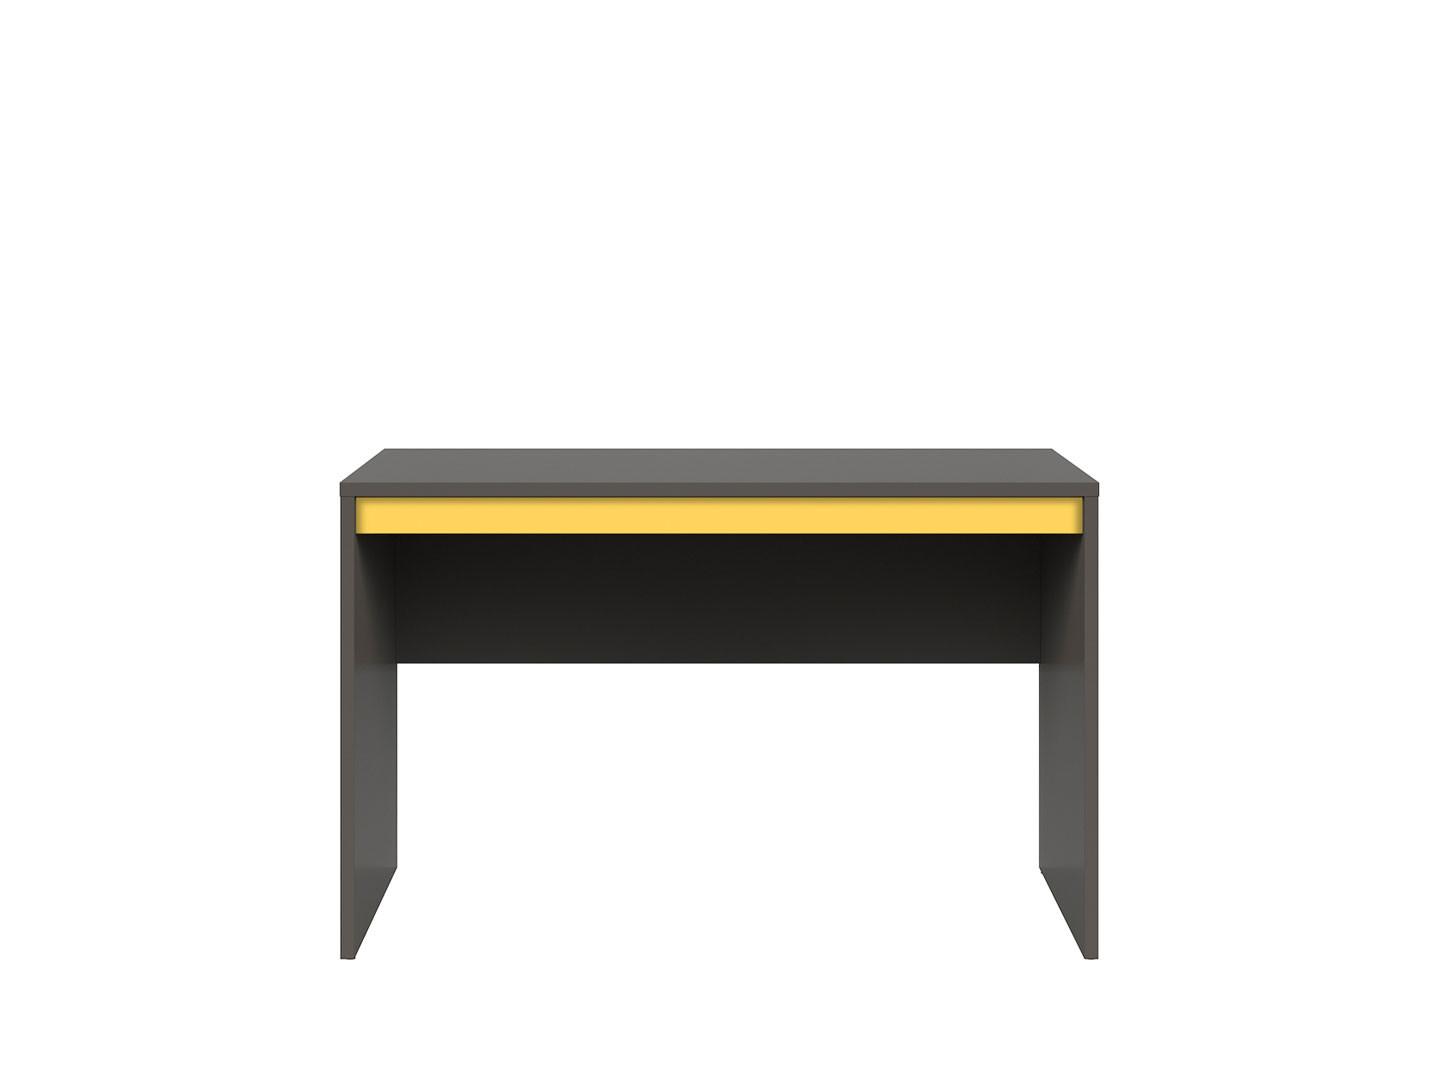 Kancelársky stôl GRAPHIC BIU/120 sivý wolfram